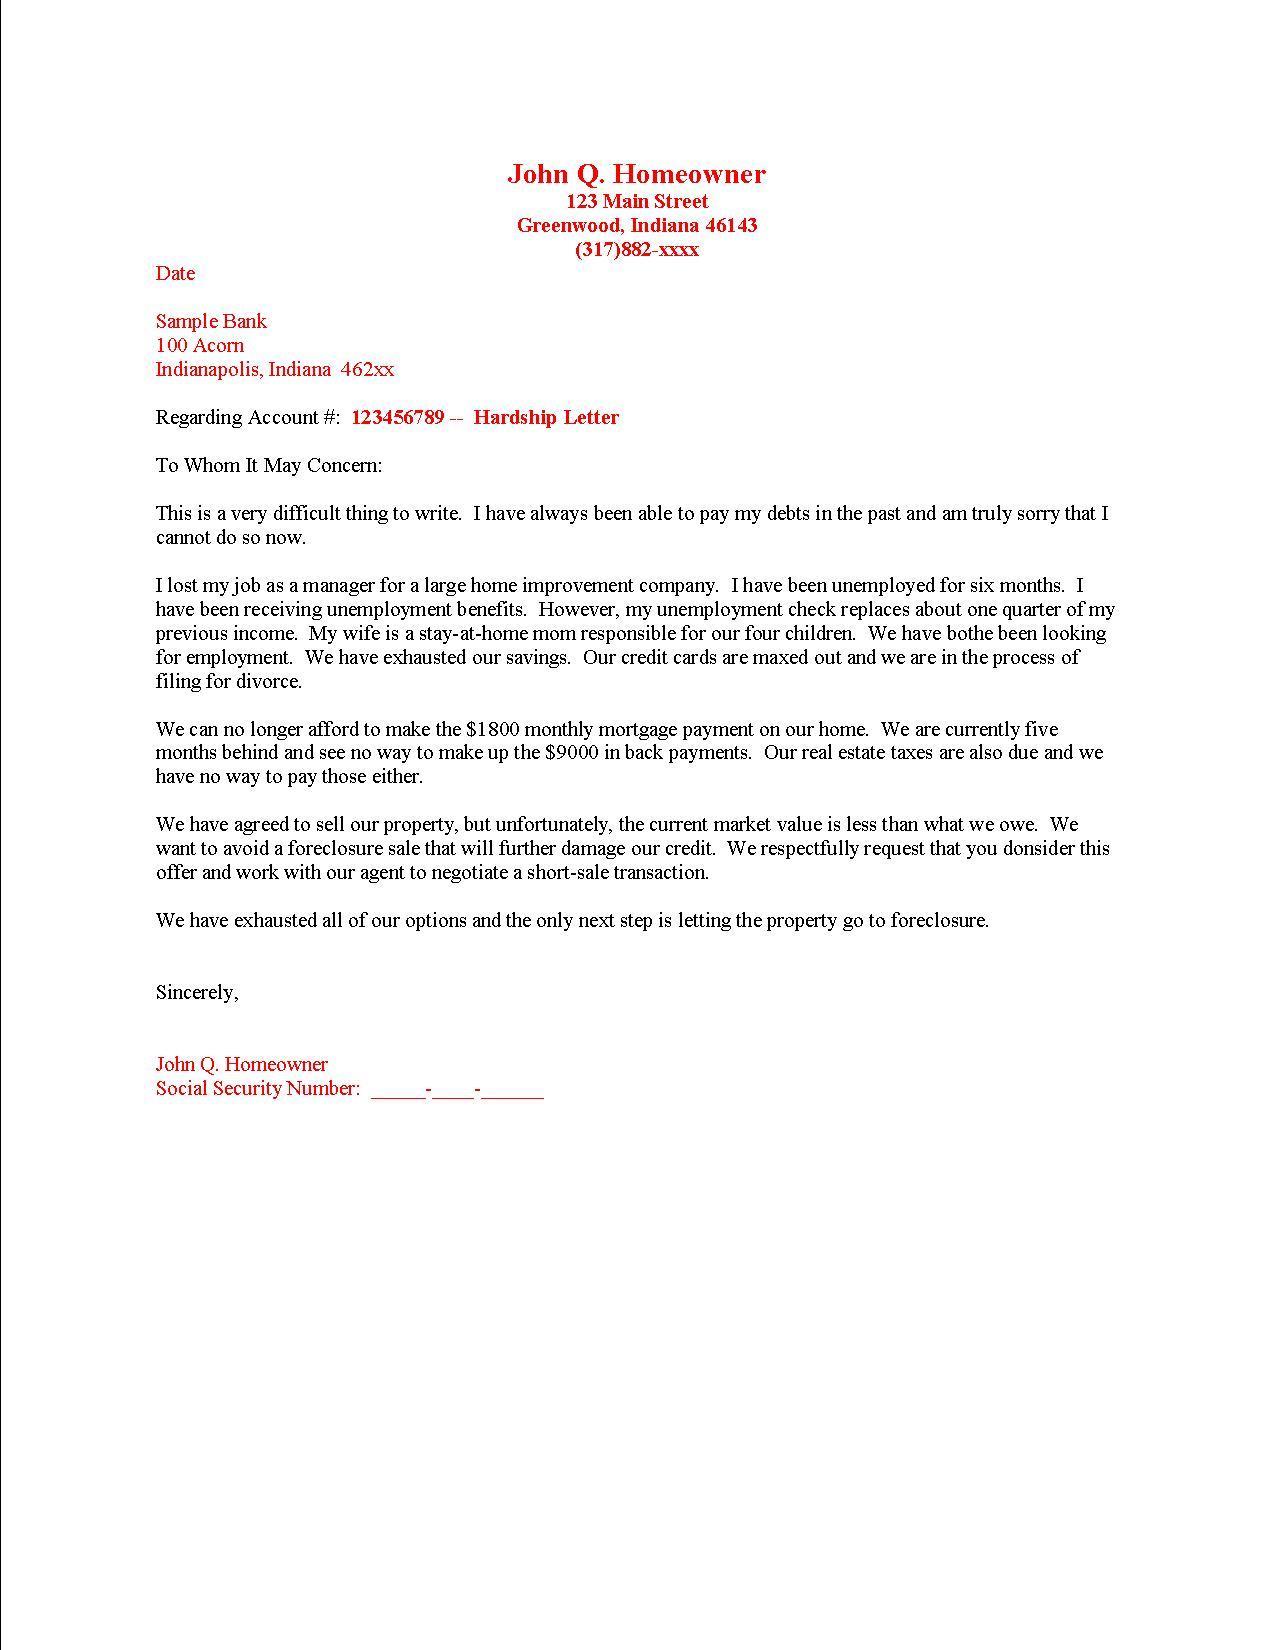 Hardship Letter For Short Sale Example   Sample Letter Service Resume